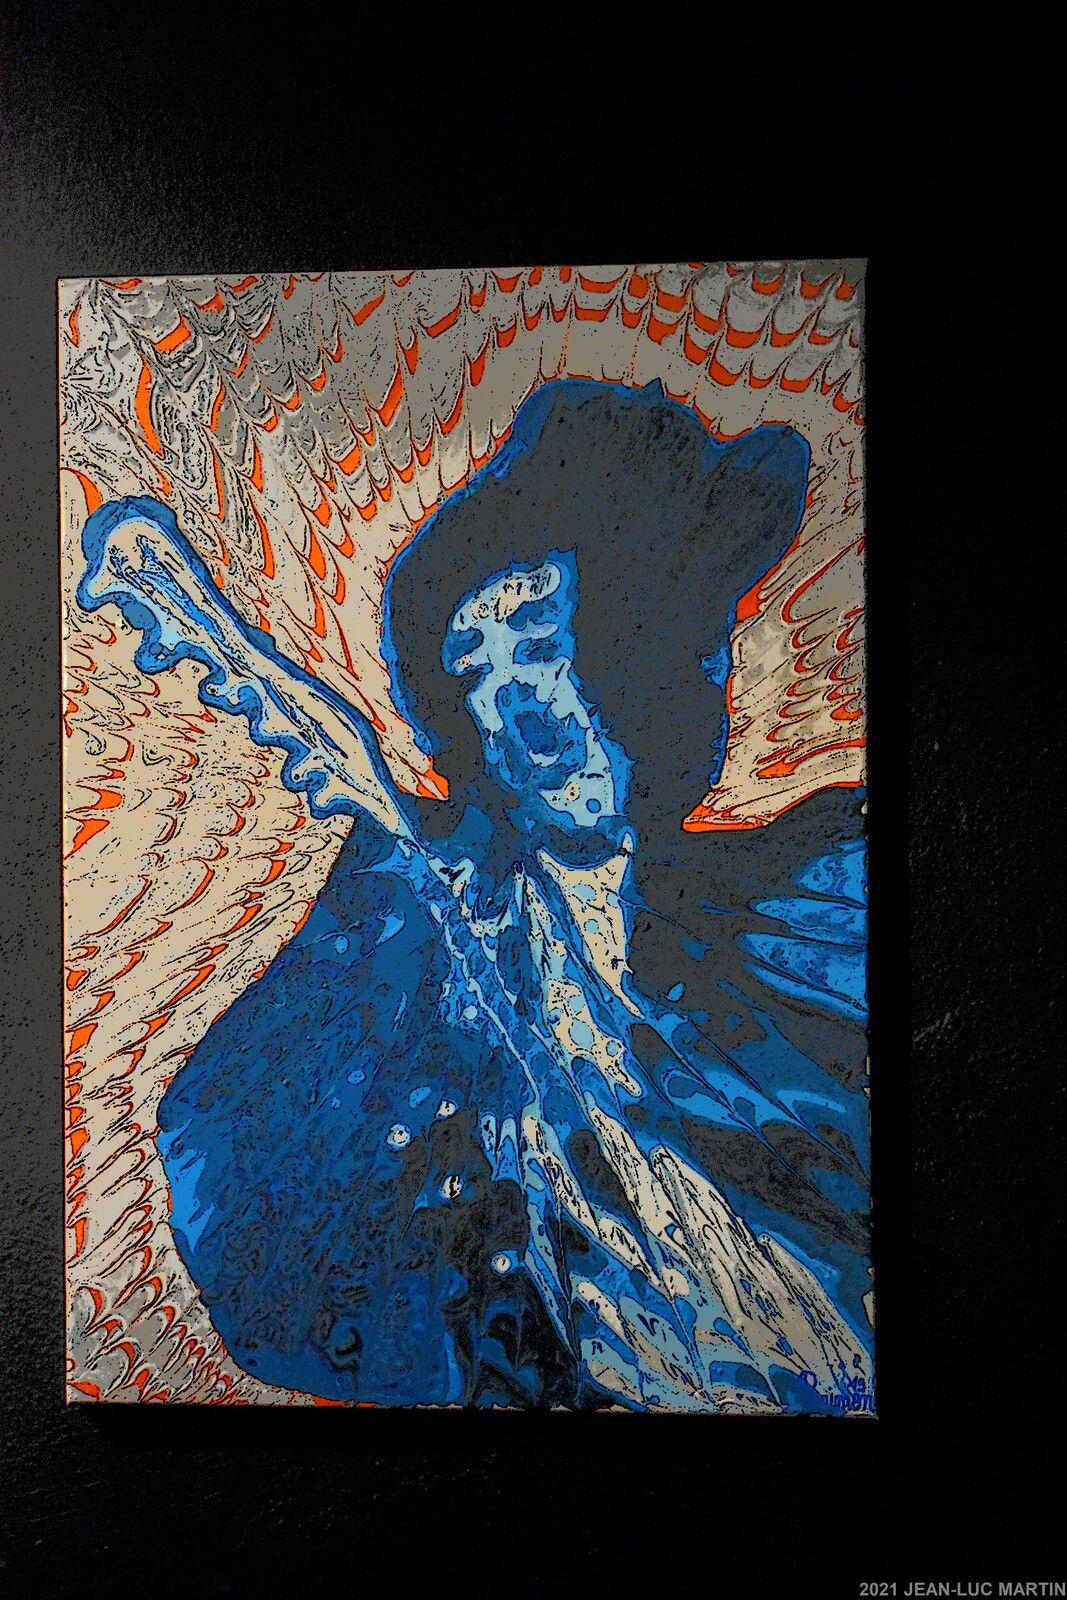 IMMY HENDRIX VOUS ATTEND AU MUSEE INTERNATIONAL DES ARTS MODESTES A SETE